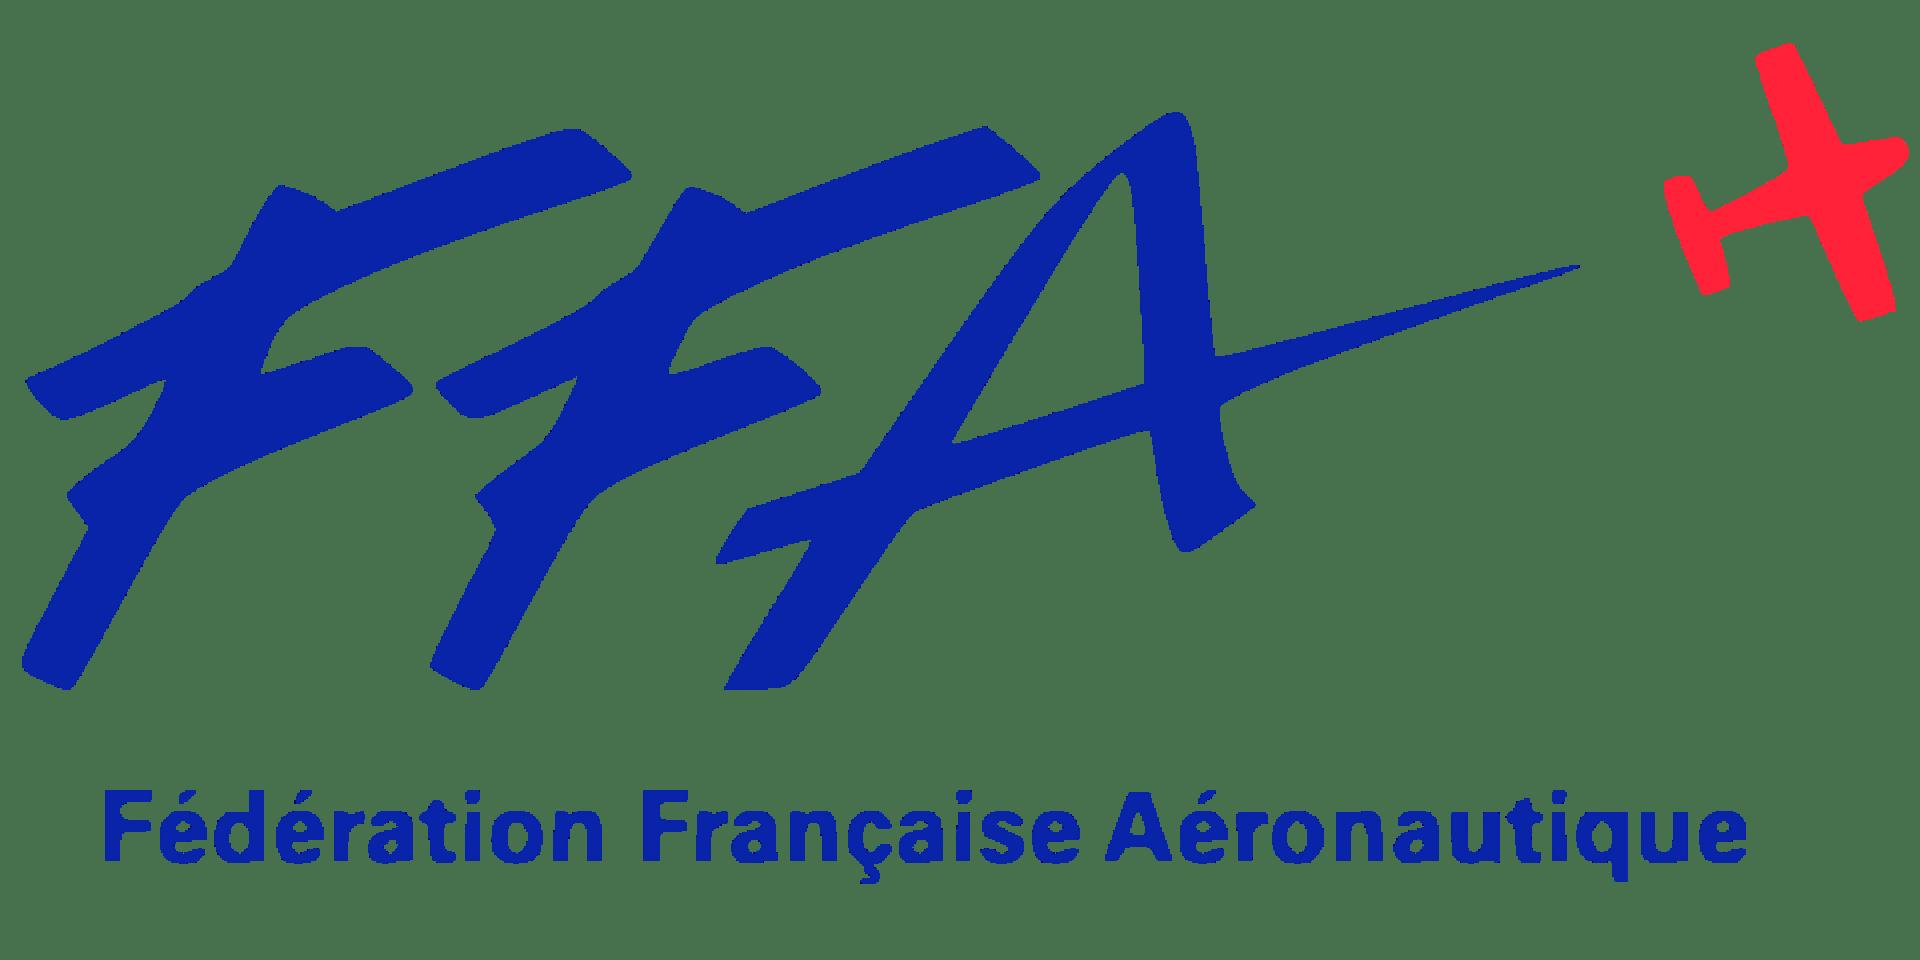 Federation Francaise Aeronautique